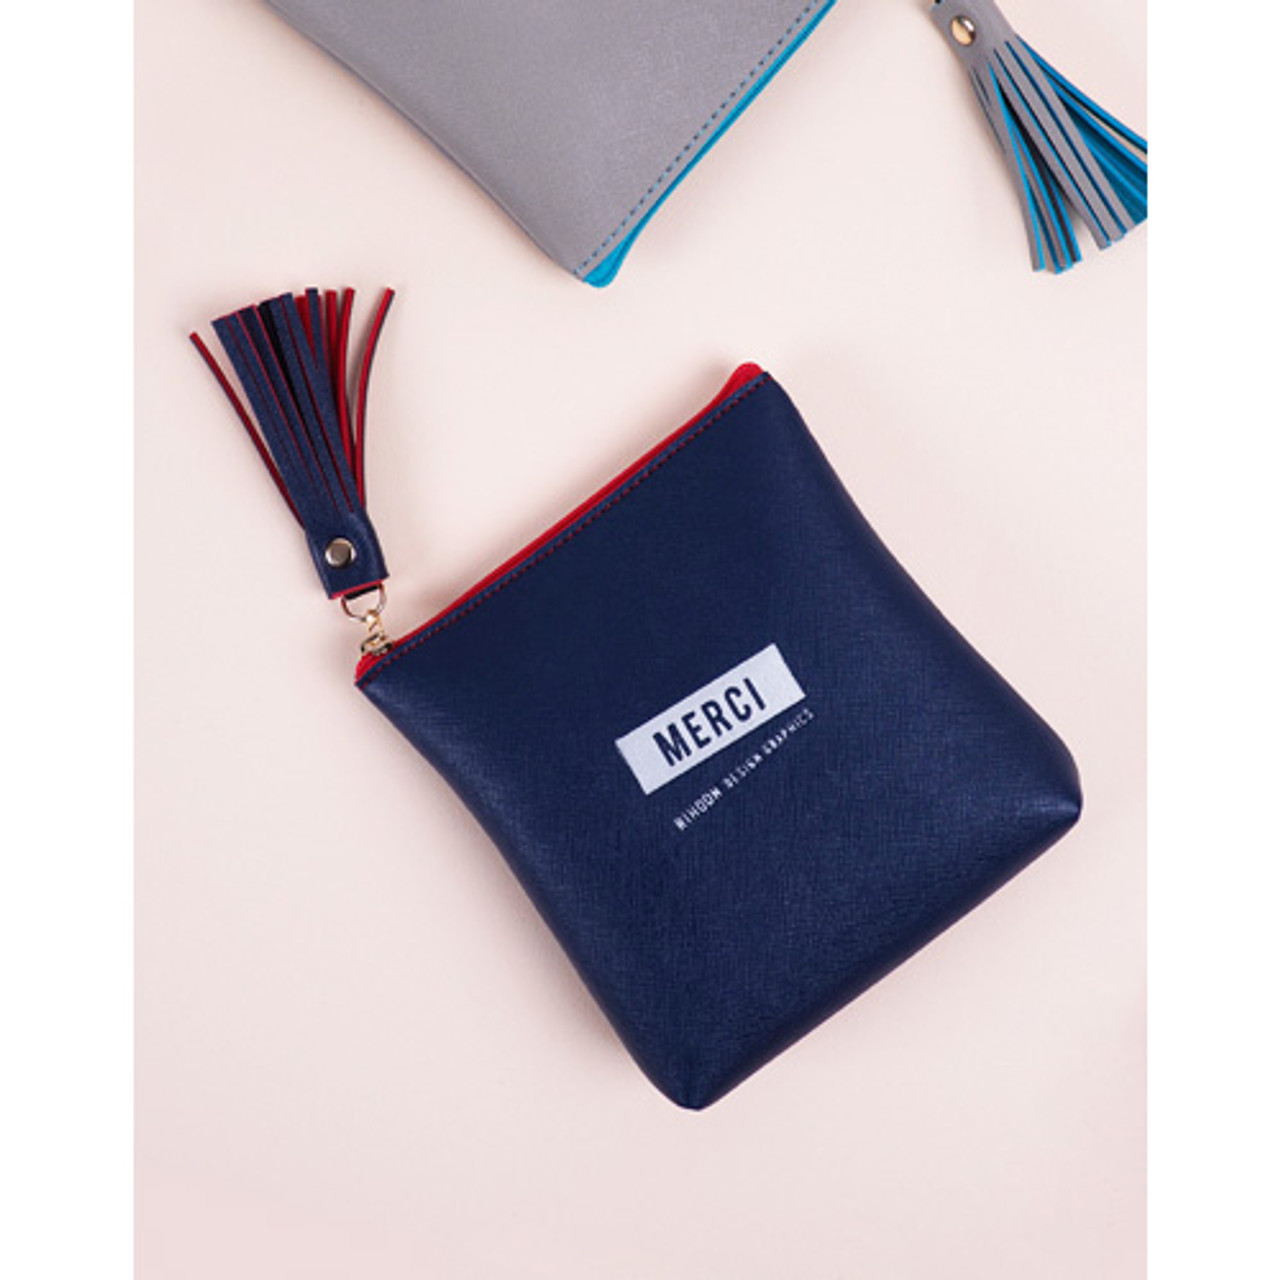 Rihoon Merci tassel zipper small pouch